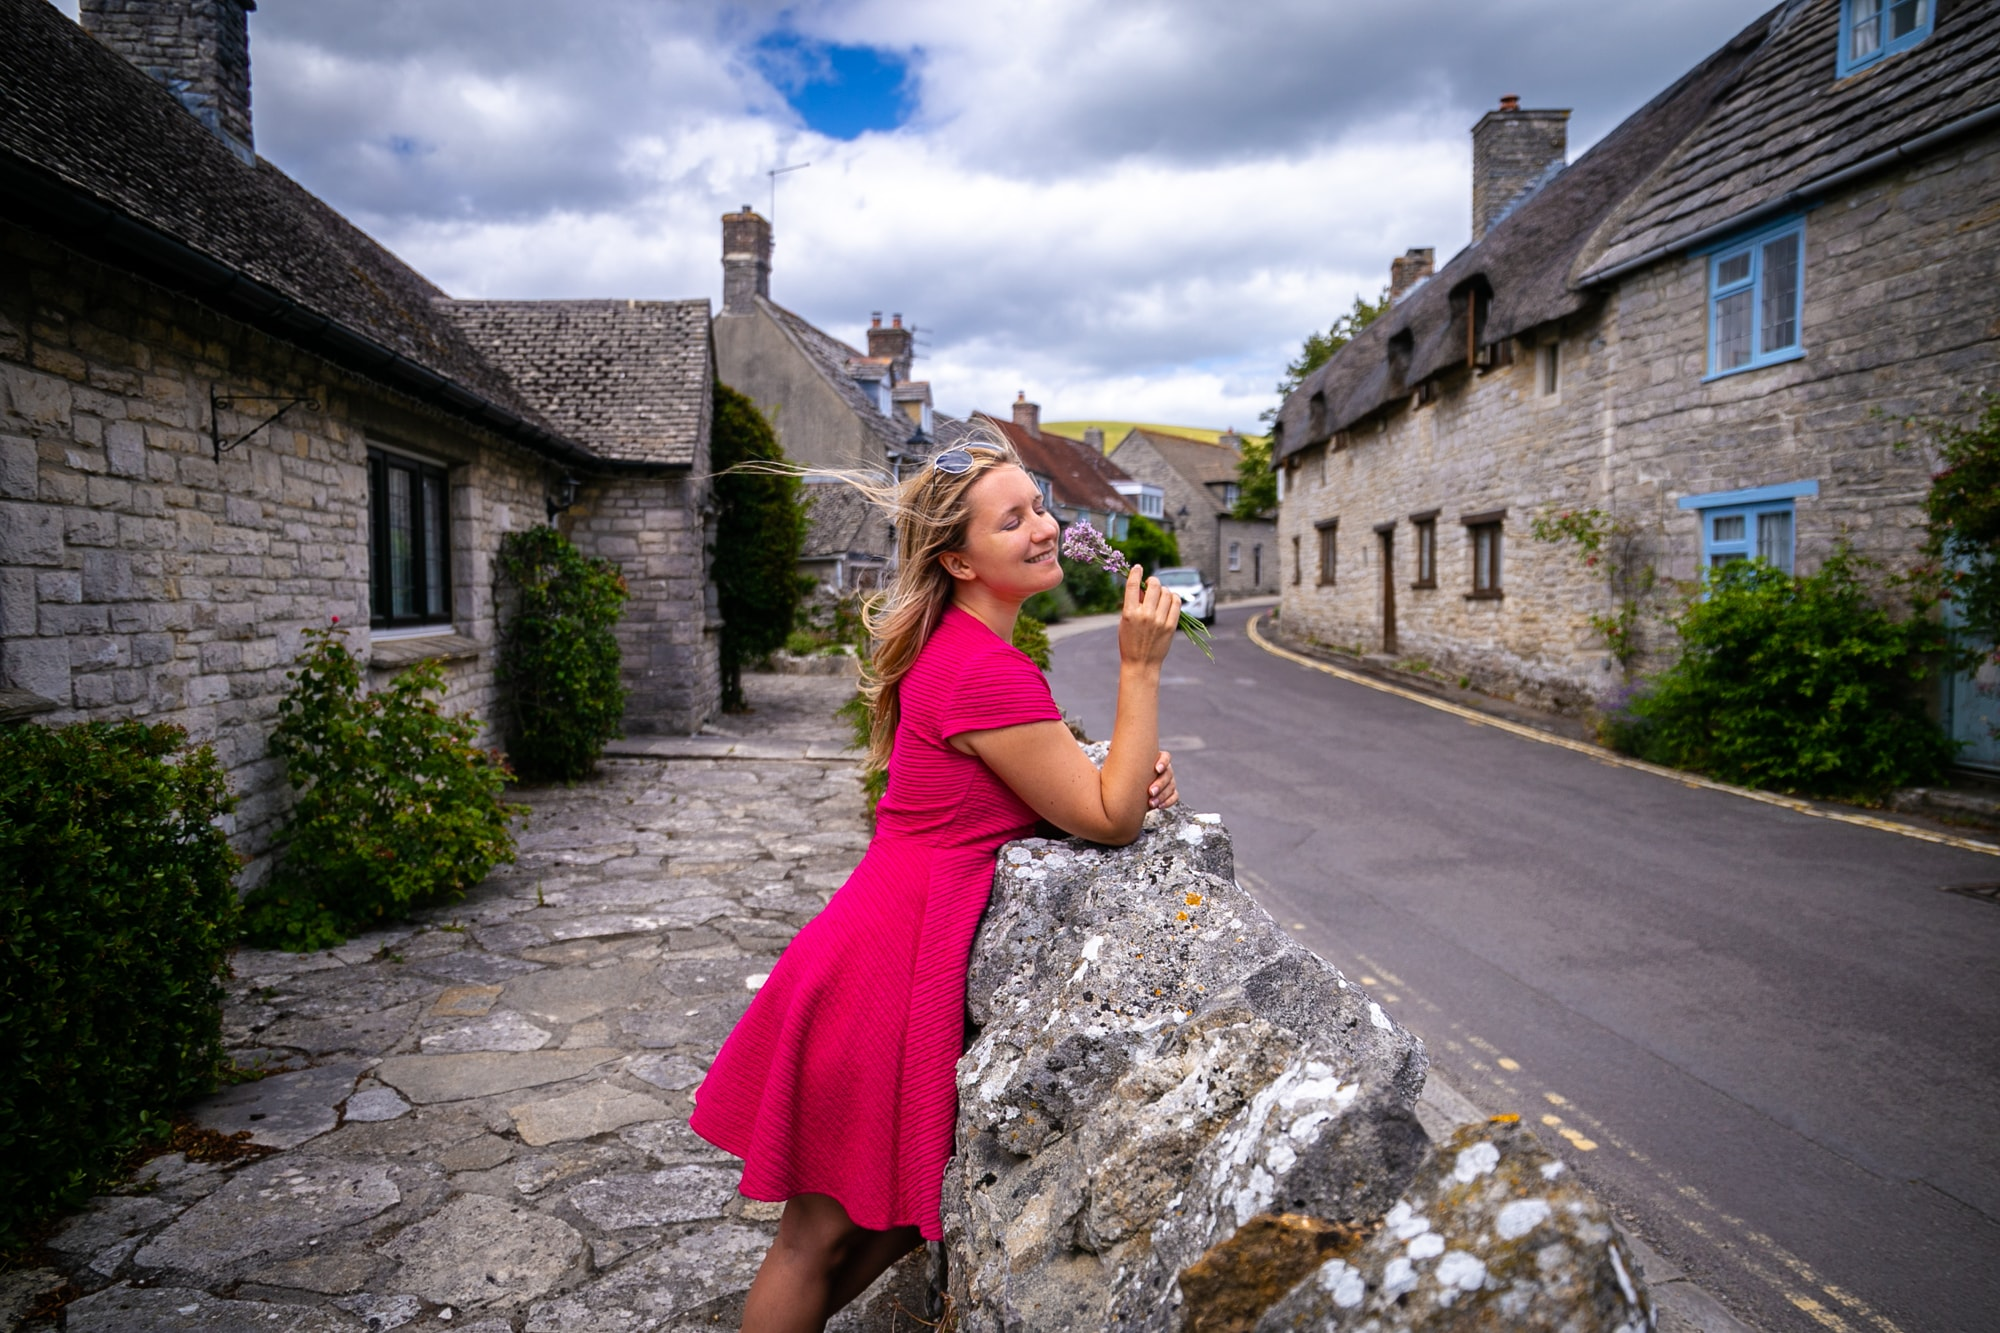 Anya Andreeva smelling lavender in British village in pink dress